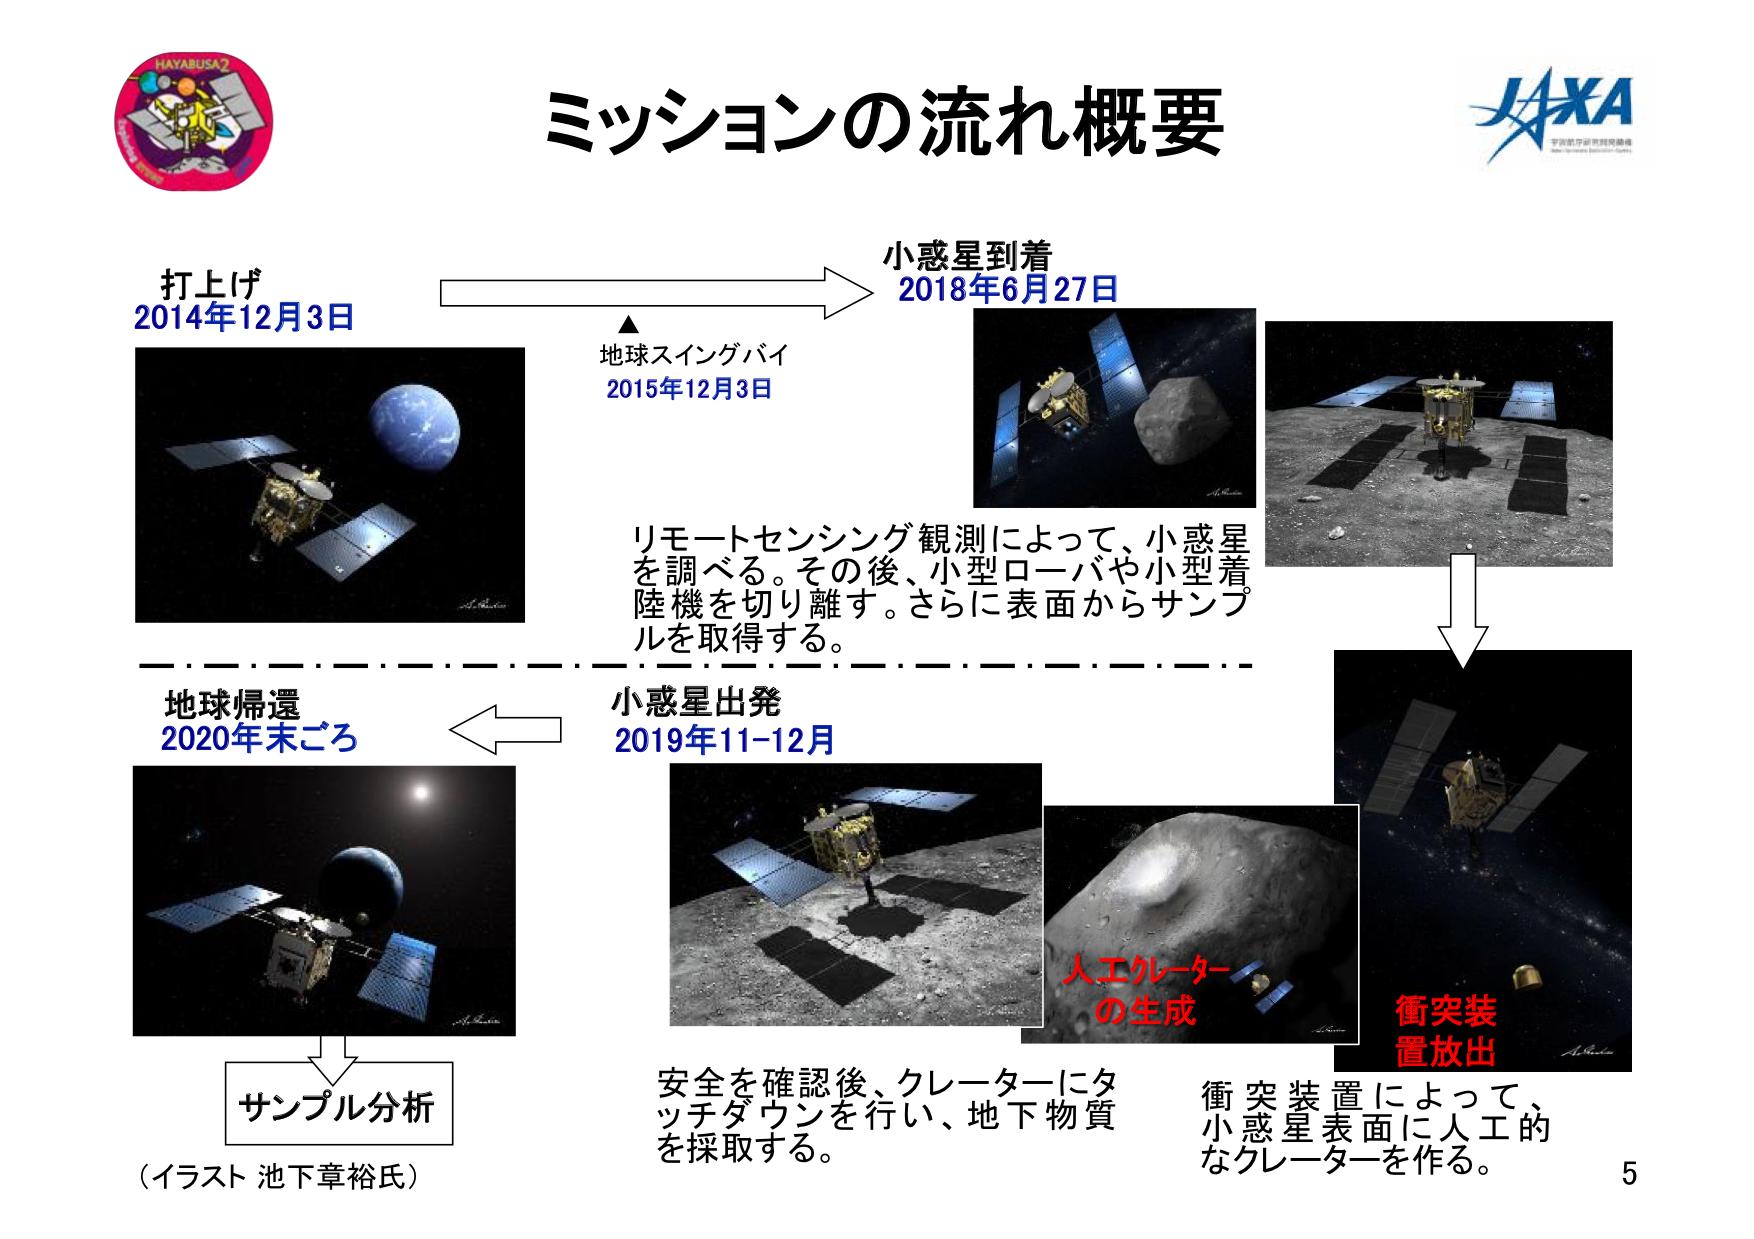 f:id:Imamura:20181011153944p:plain